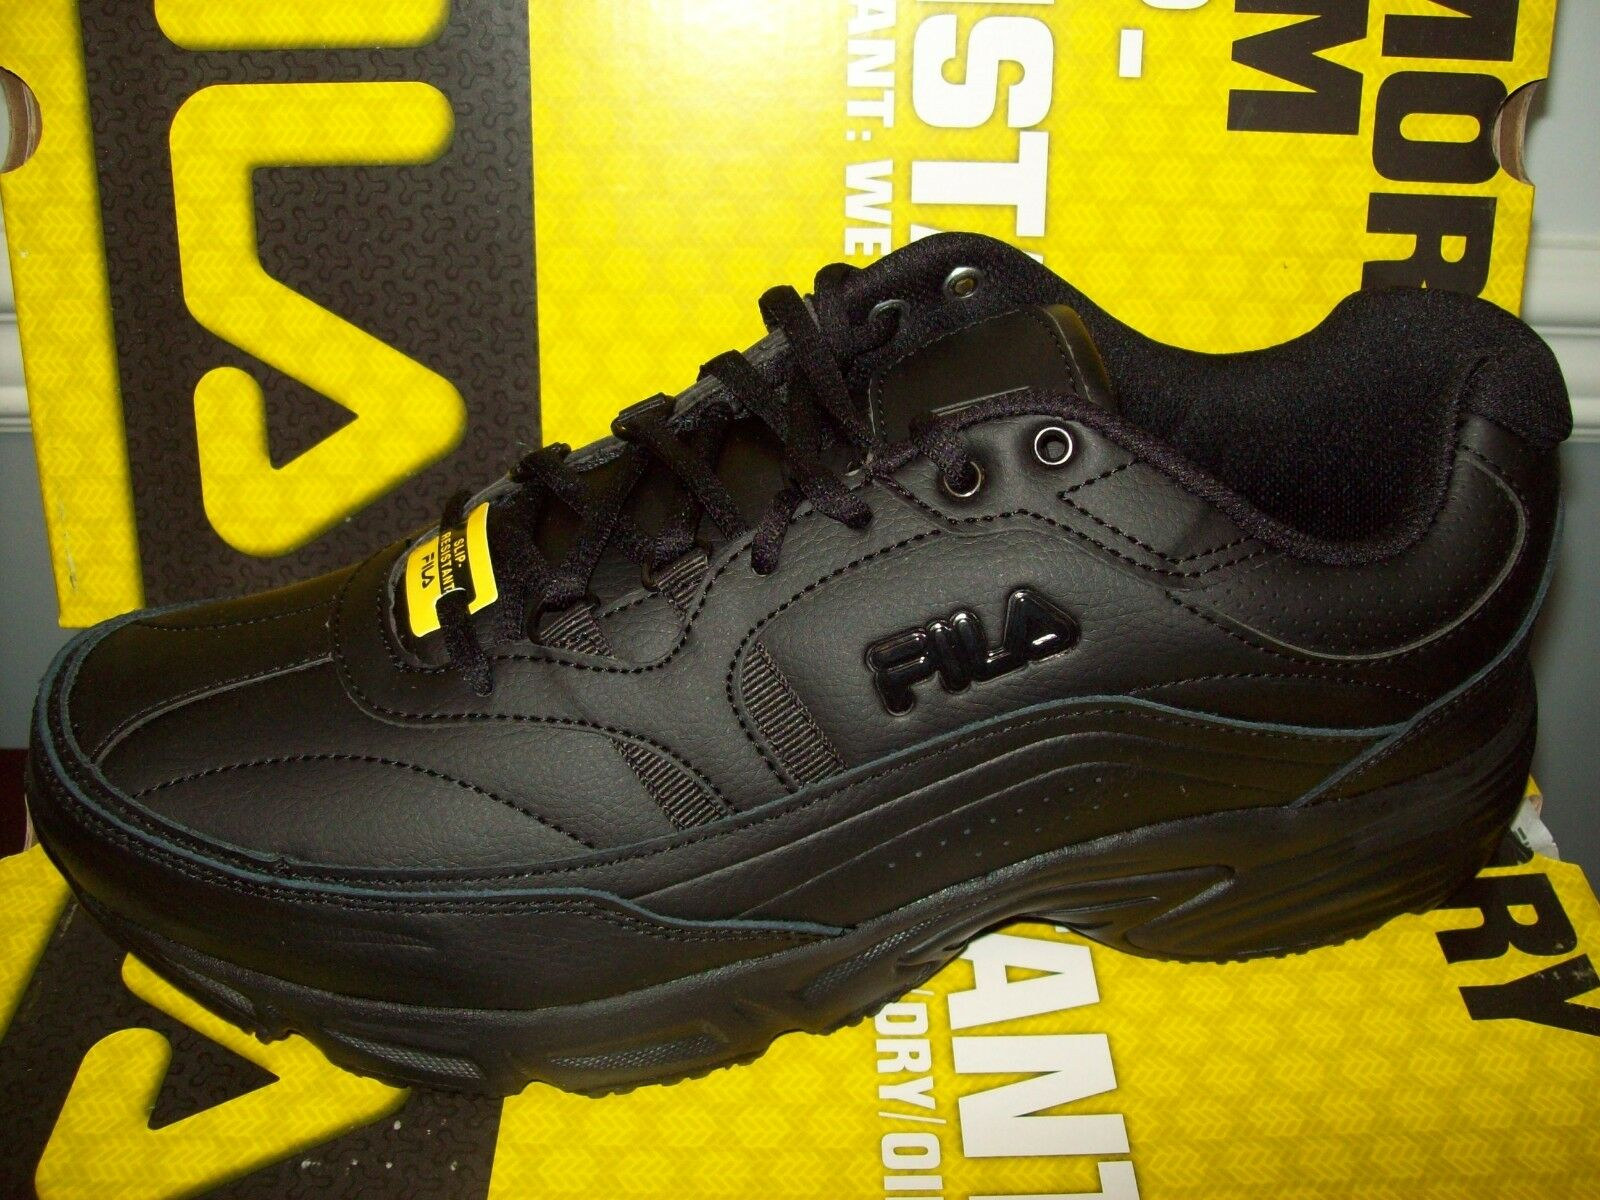 Fila Men's Memory Workshift Slip-Resistant Sneaker #ISG30002-001 All Black Med Cheap and beautiful fashion